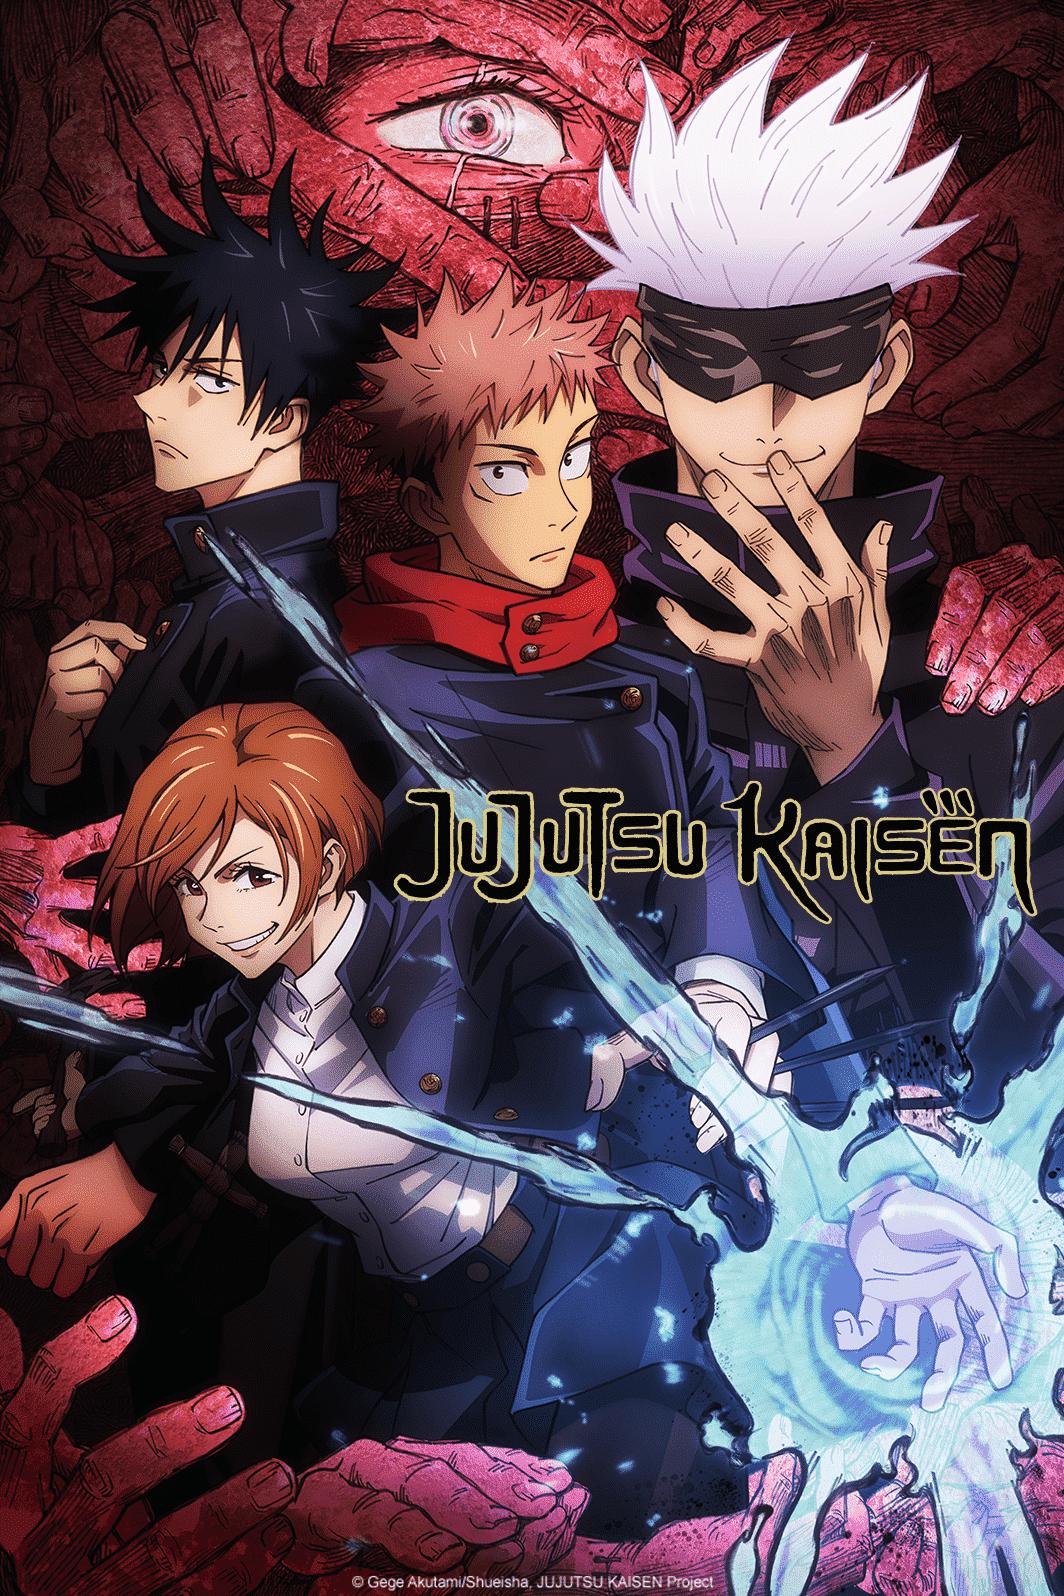 Jujutsu Kaisen (2020) มหาเวทย์ผนึกมาร ซับไทย EP1 – EP5